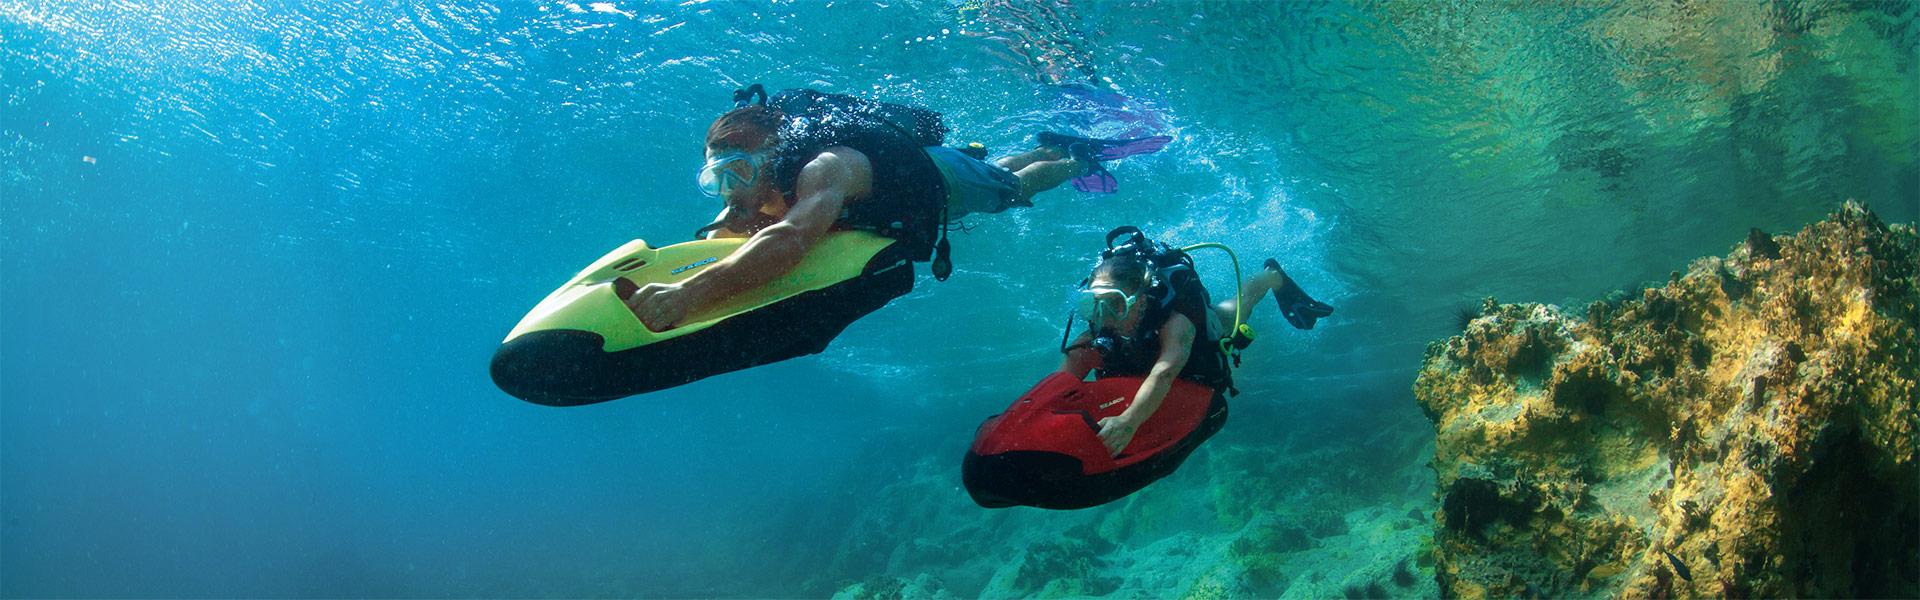 seabob-erlebnis-scuba